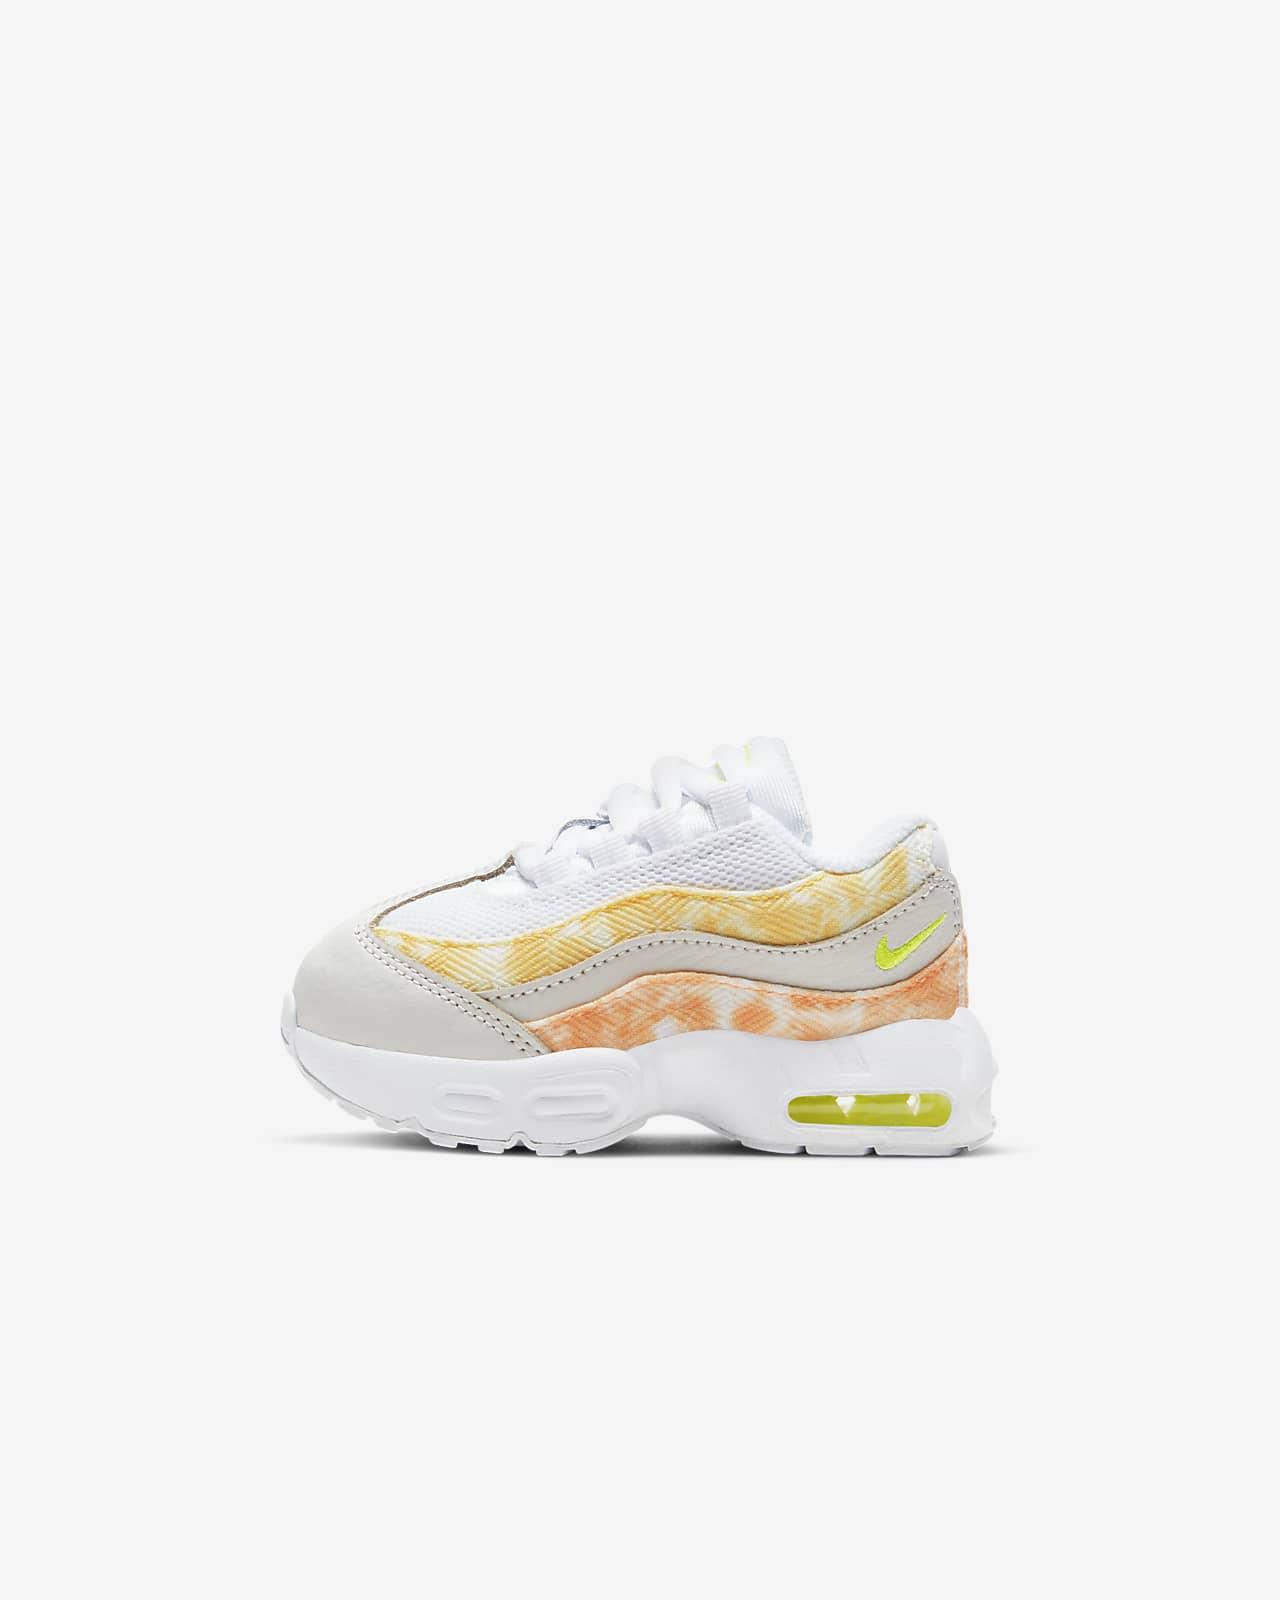 Nike Air Max 95 sko til sped-/småbarn